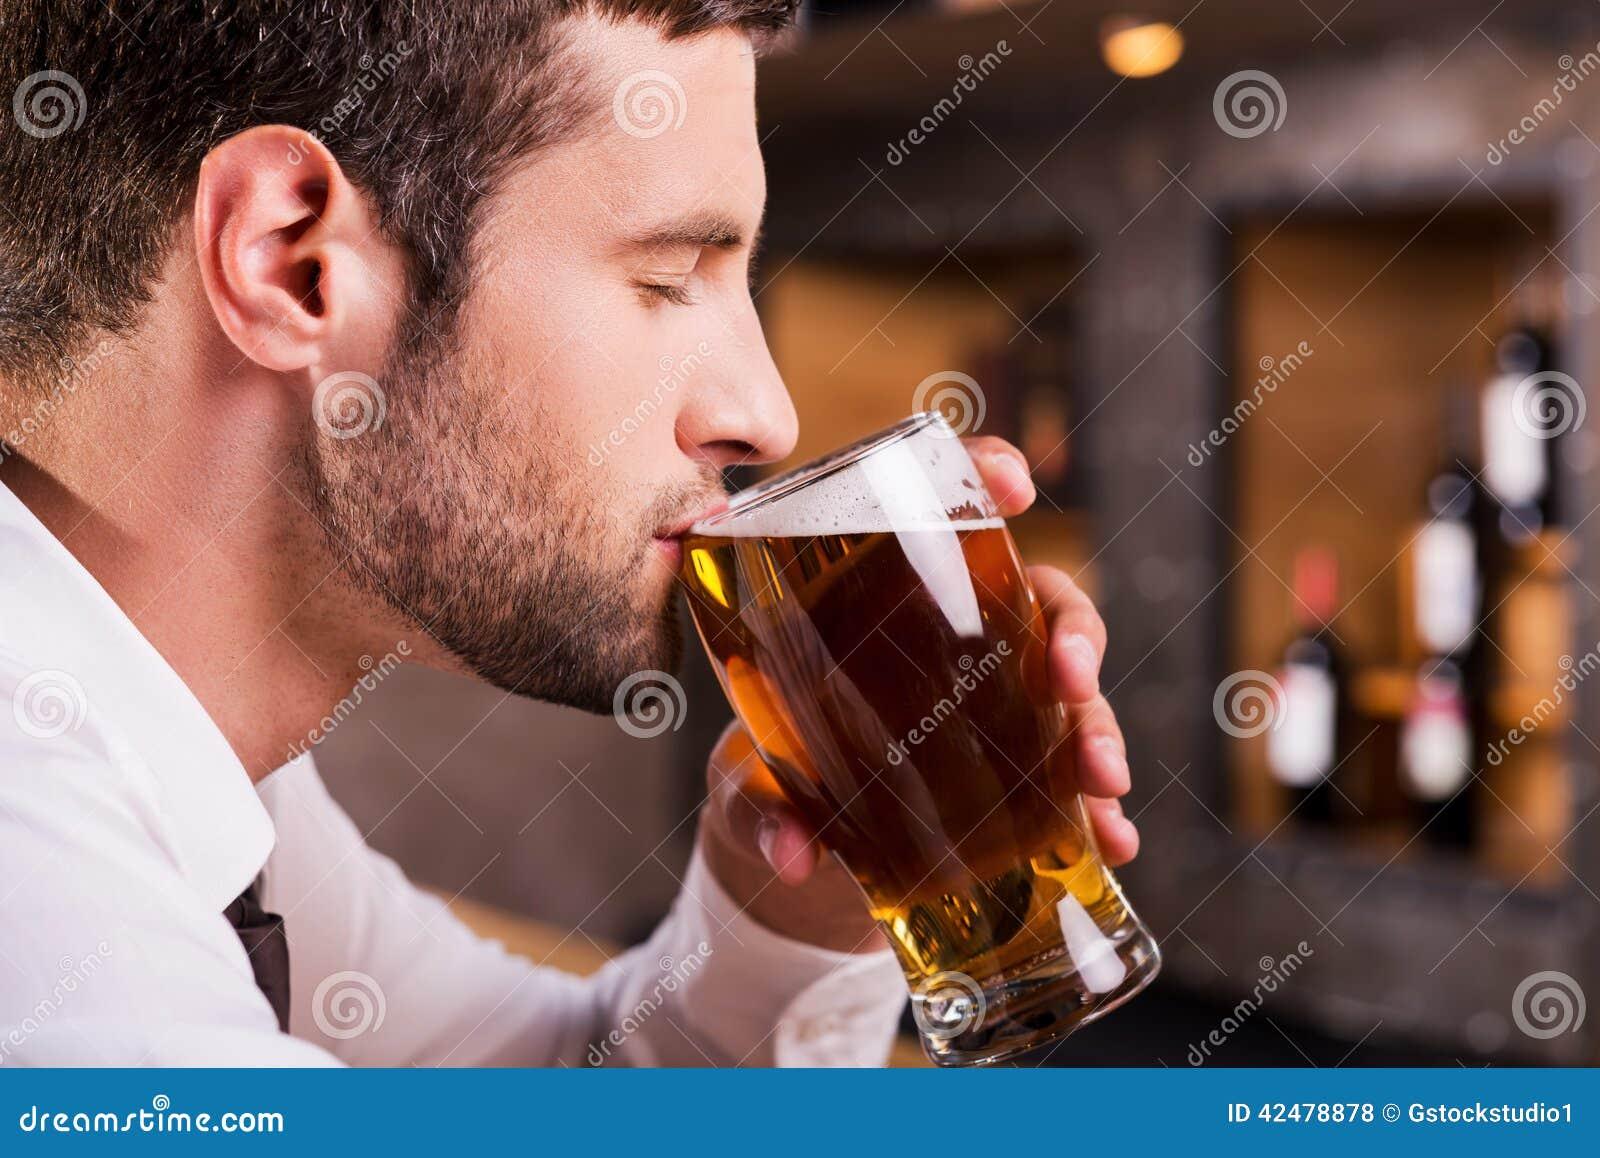 Man drinking beer.